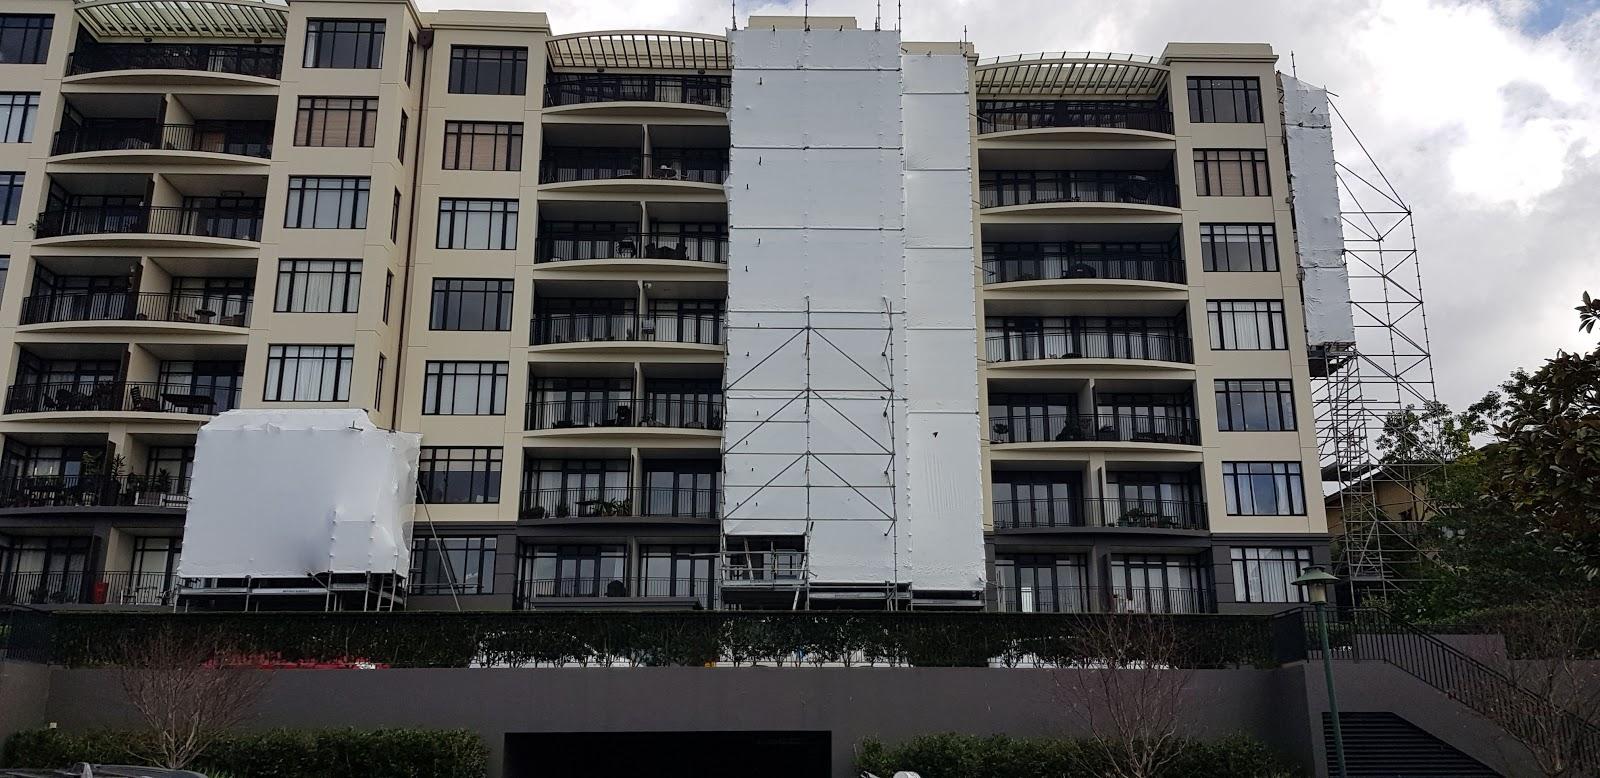 James Cook Cres Apartments .jpg